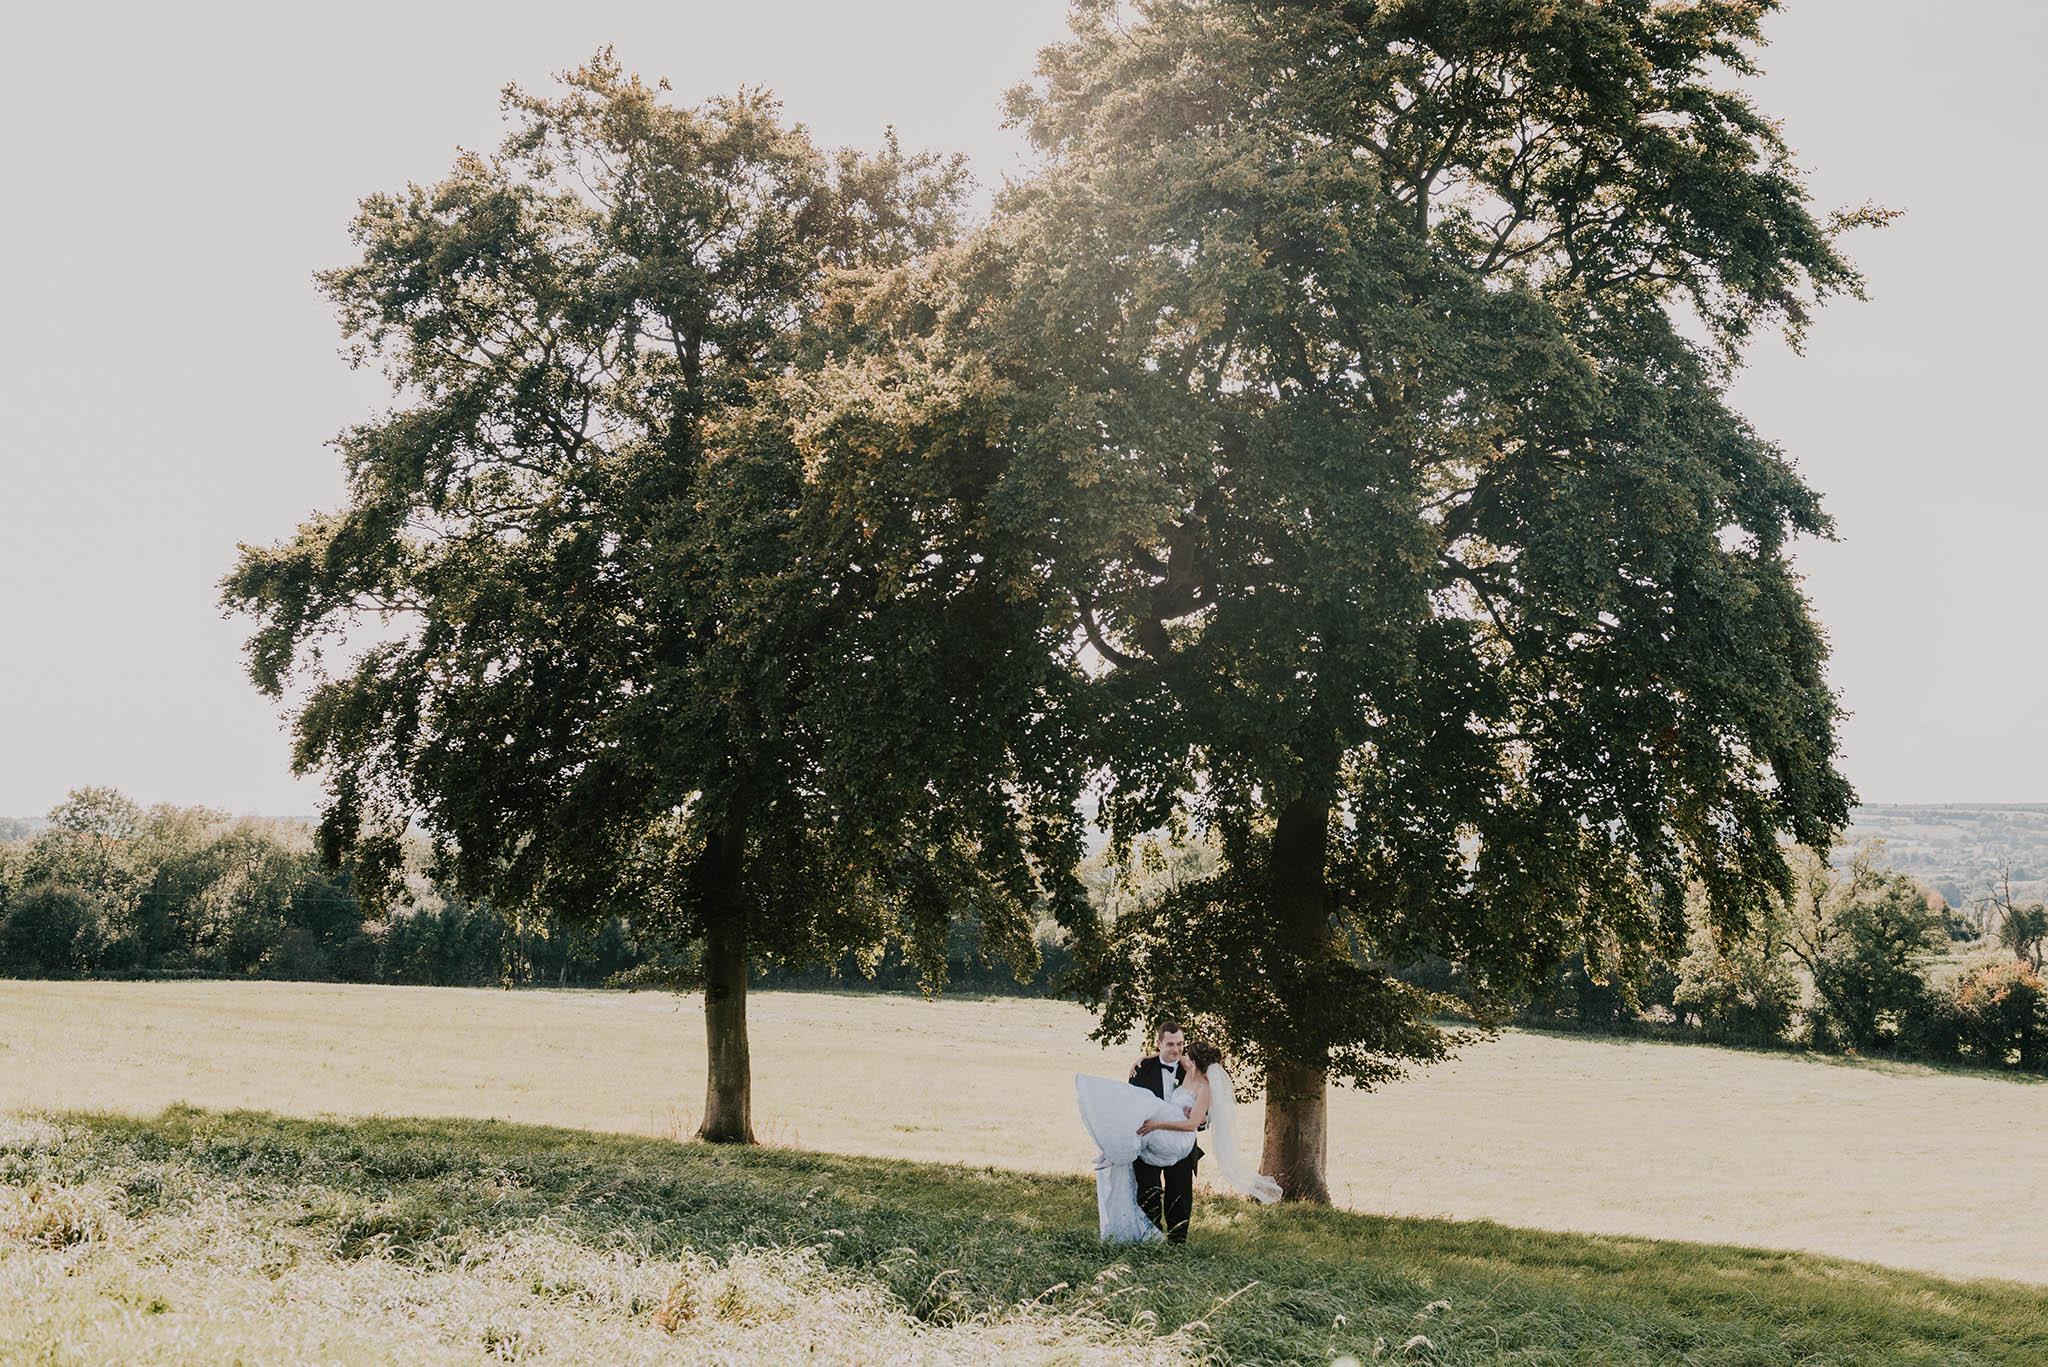 JC293-wedding-blog-scott-stockwell-photography-end-2017.jpg